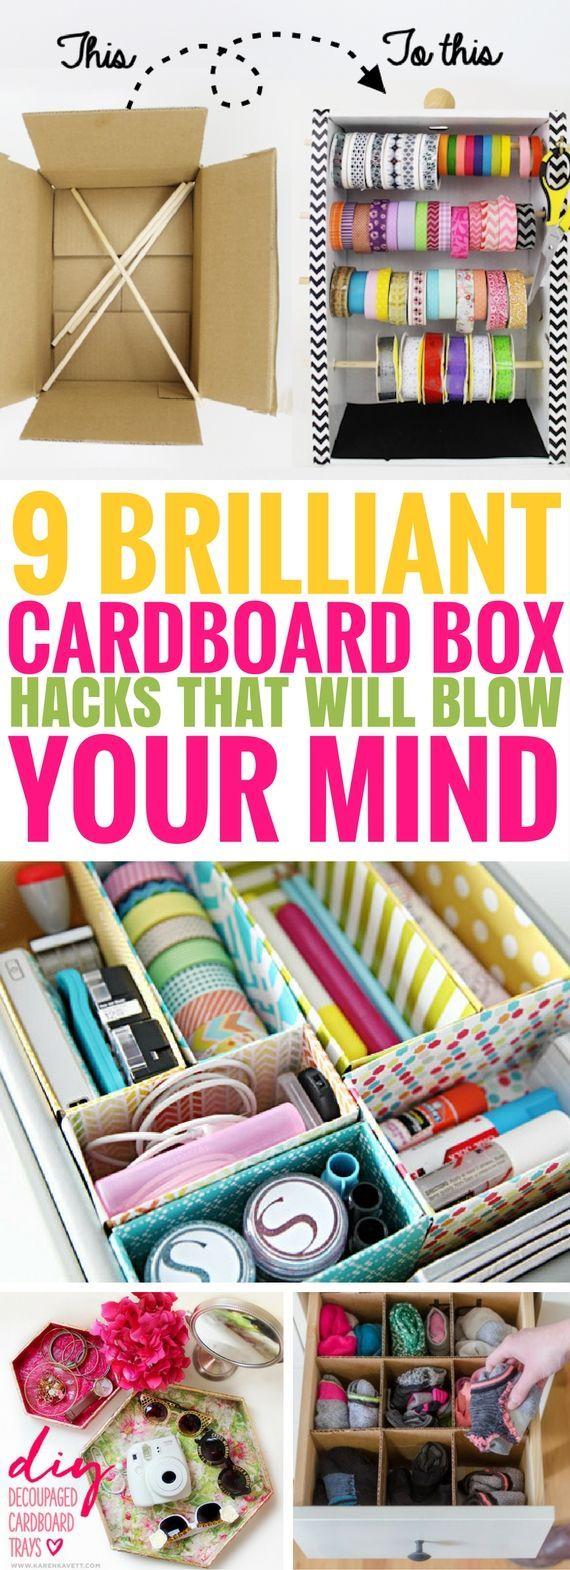 9 Effortless Cardboard Box Hacks You Need To Try Craftsonfire Diy Cardboard Box Hacks Cardboard Organizer